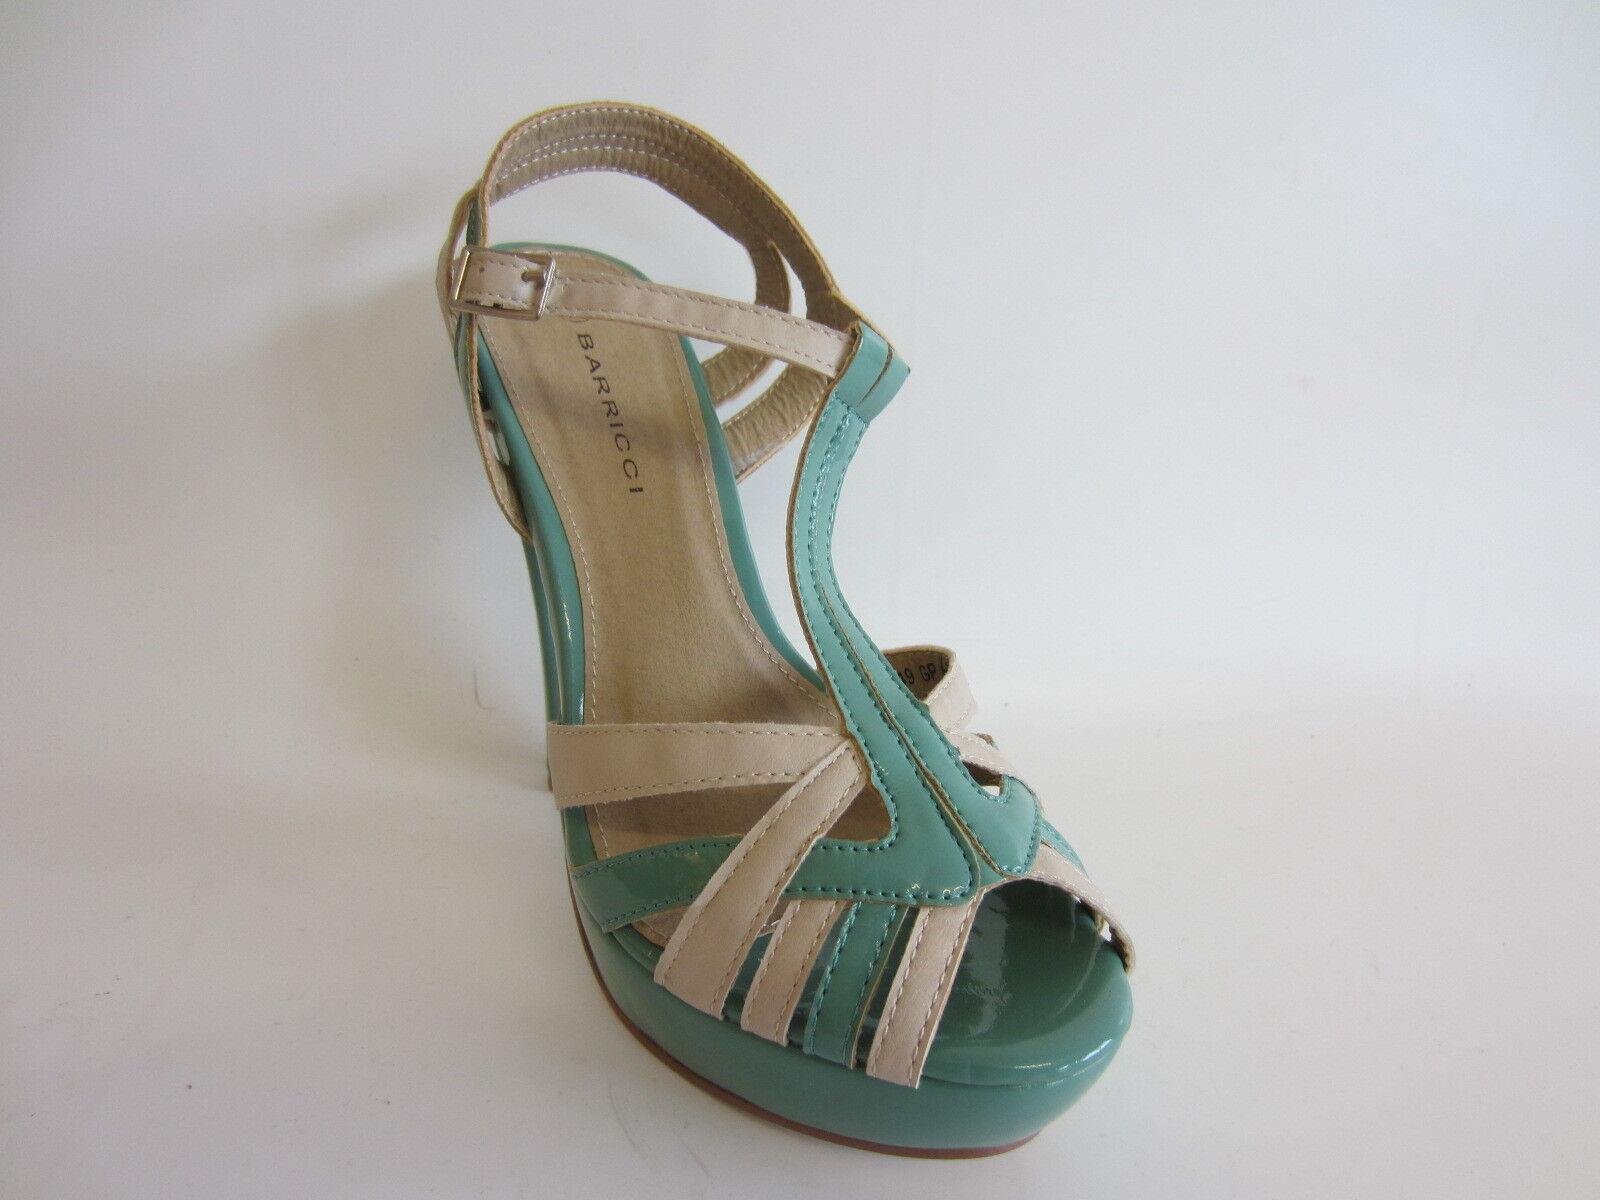 Moda jest prosta i niedroga Barricci F1949 Ladies Green Multi Patient Peep-toe Heel Shoe (R64A) (Kett)